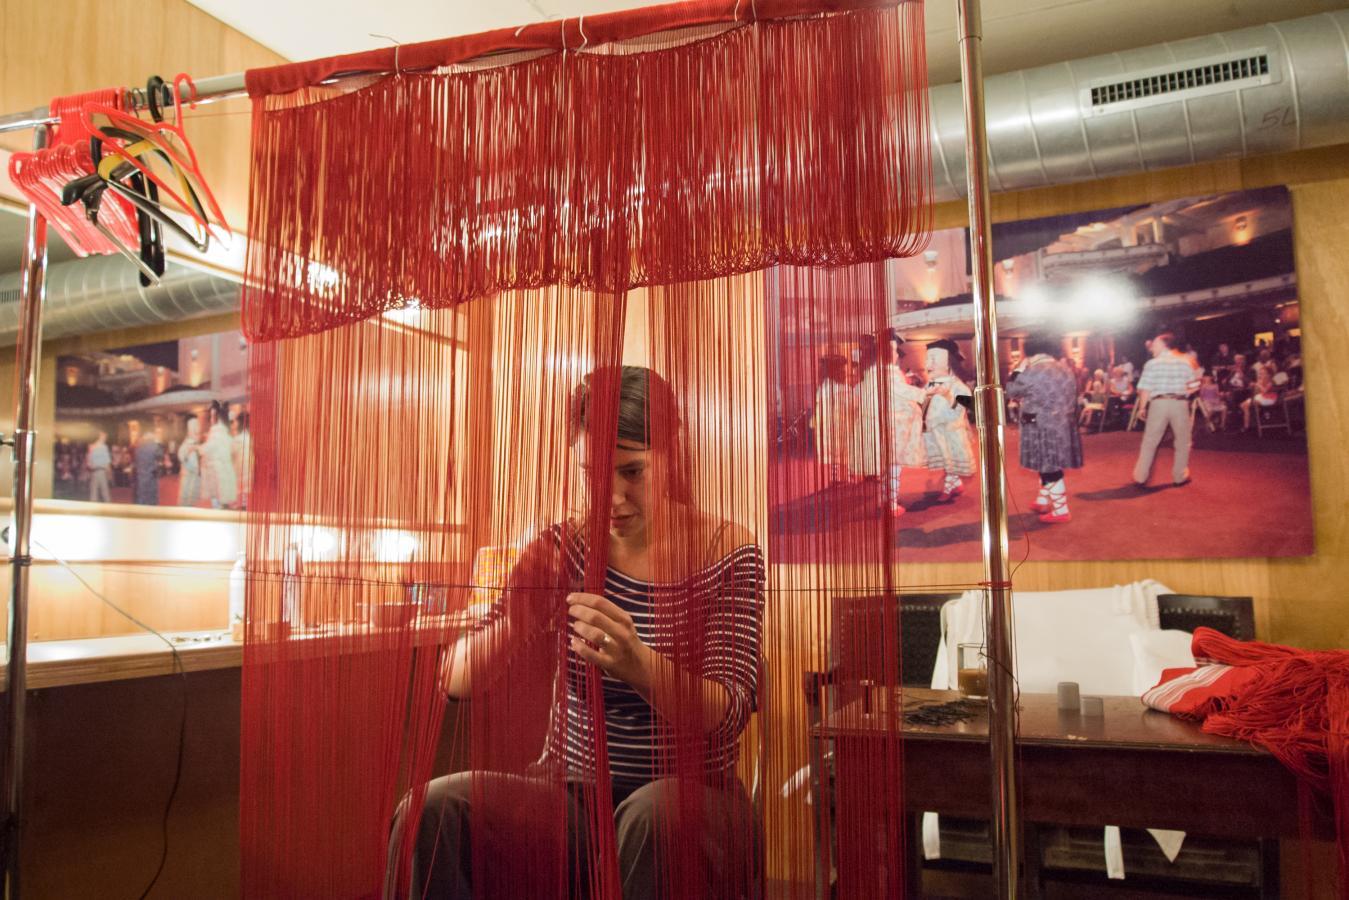 creating-theatre-martha-tentatief-antwerp-2006